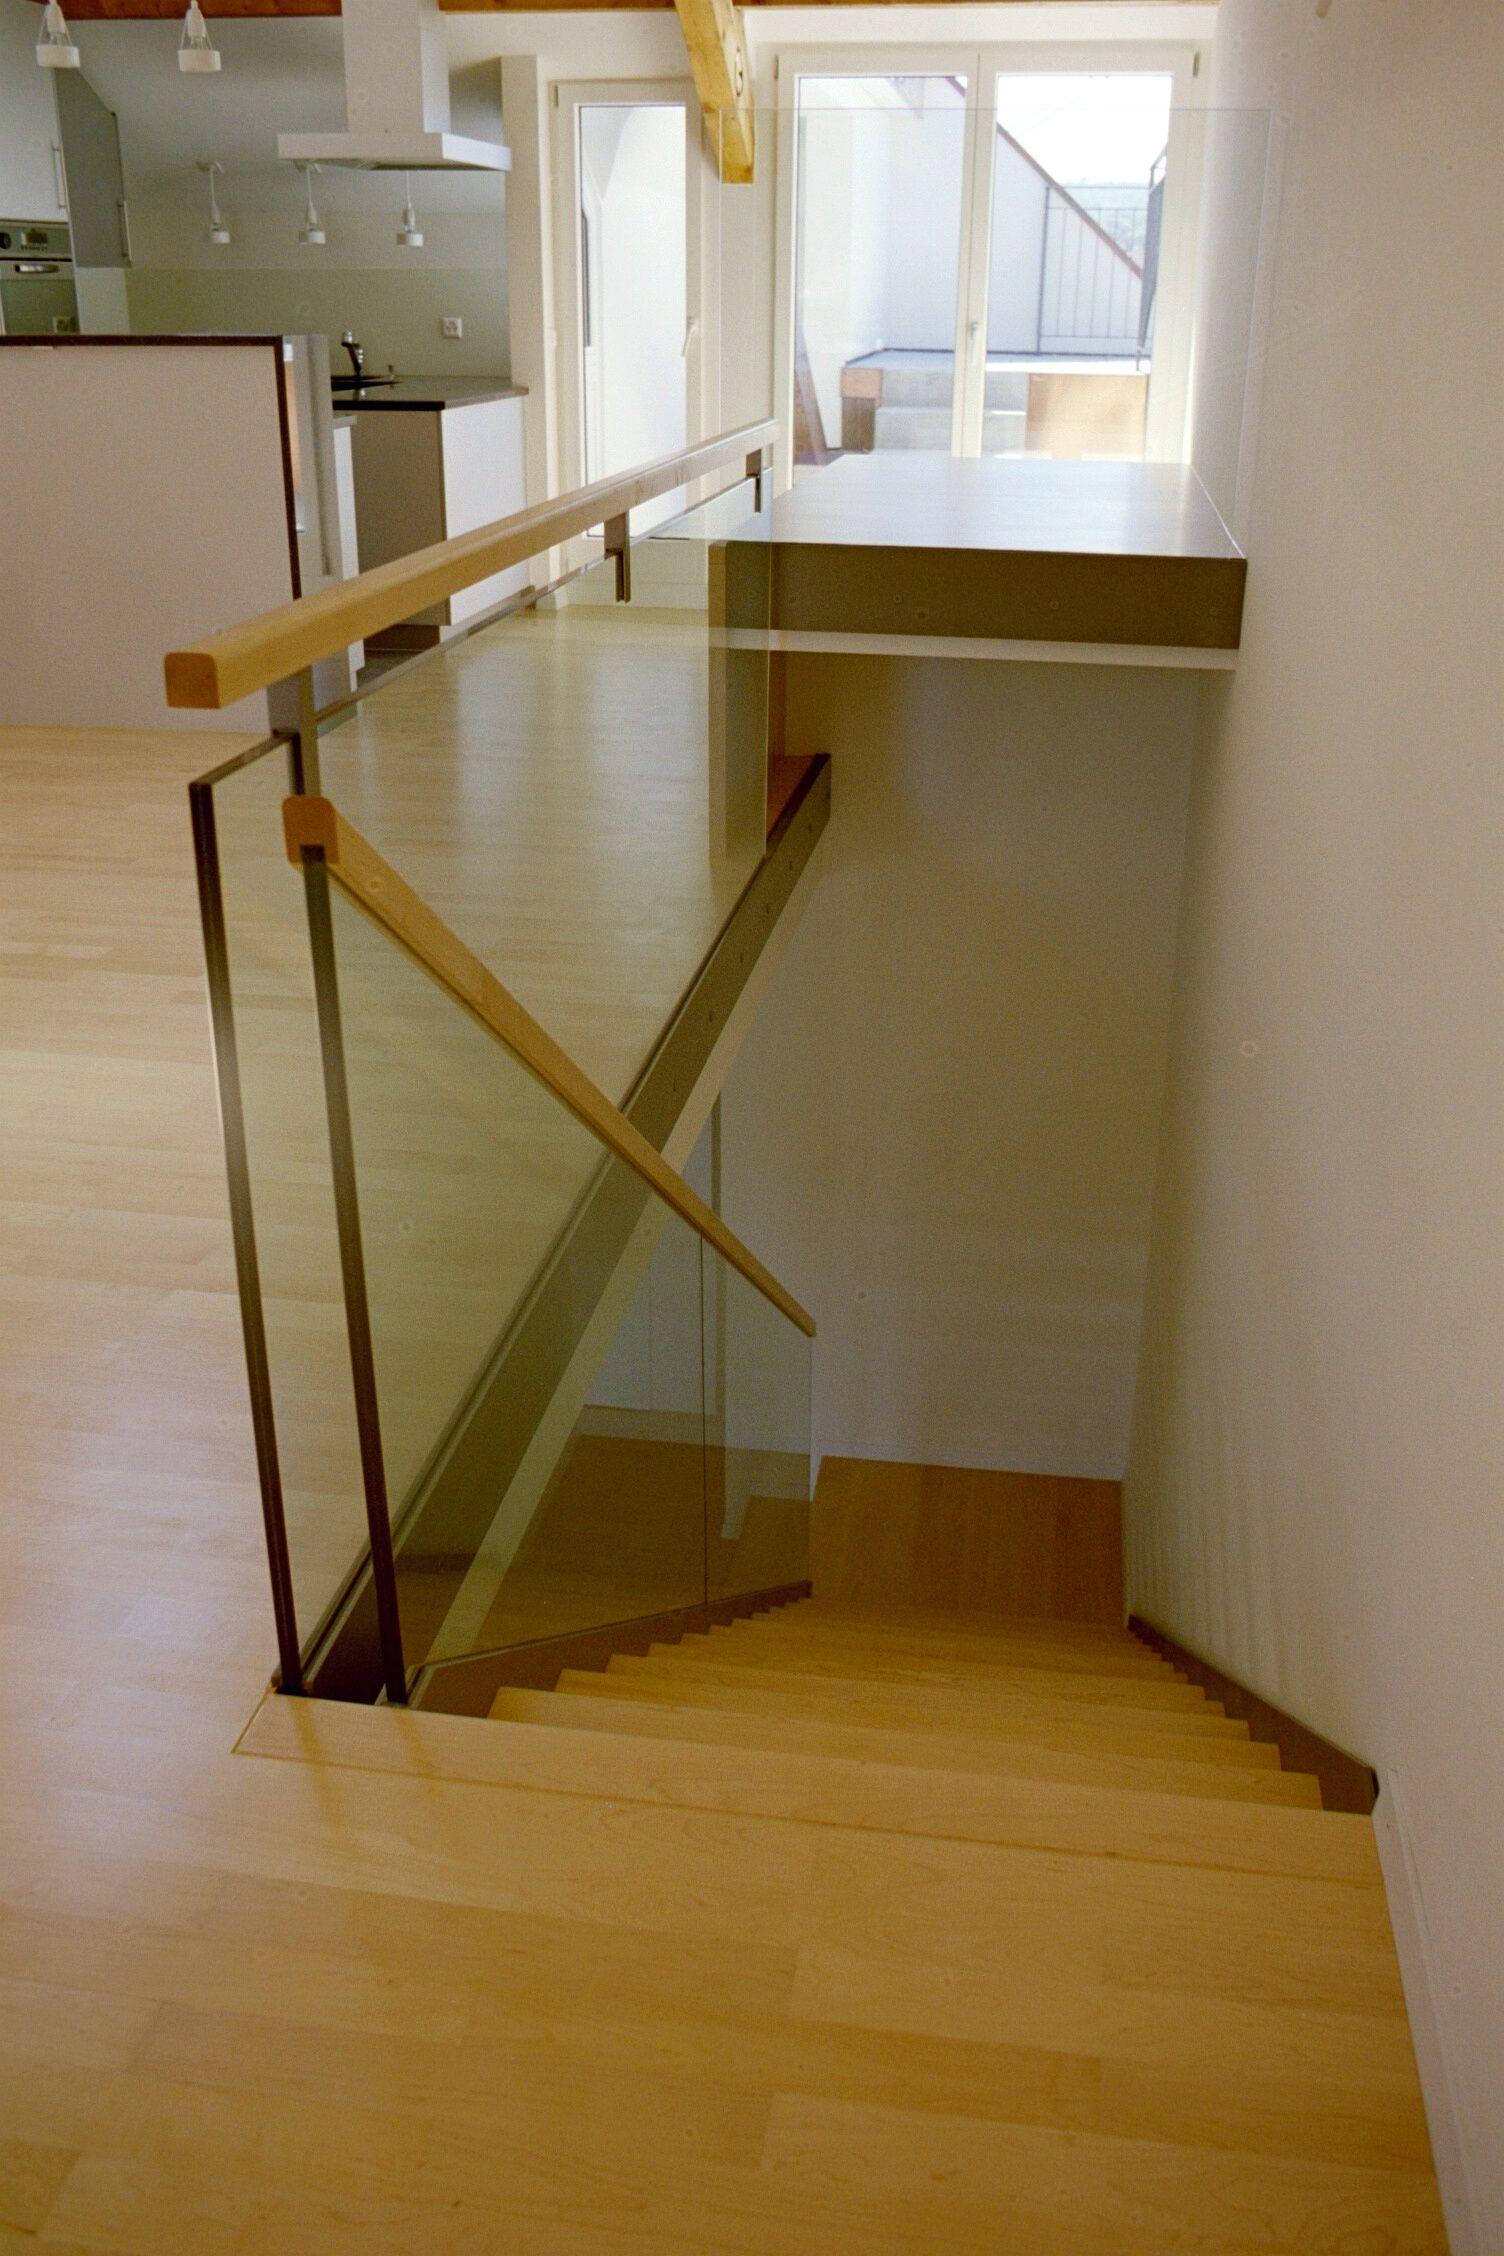 Stair Image 21